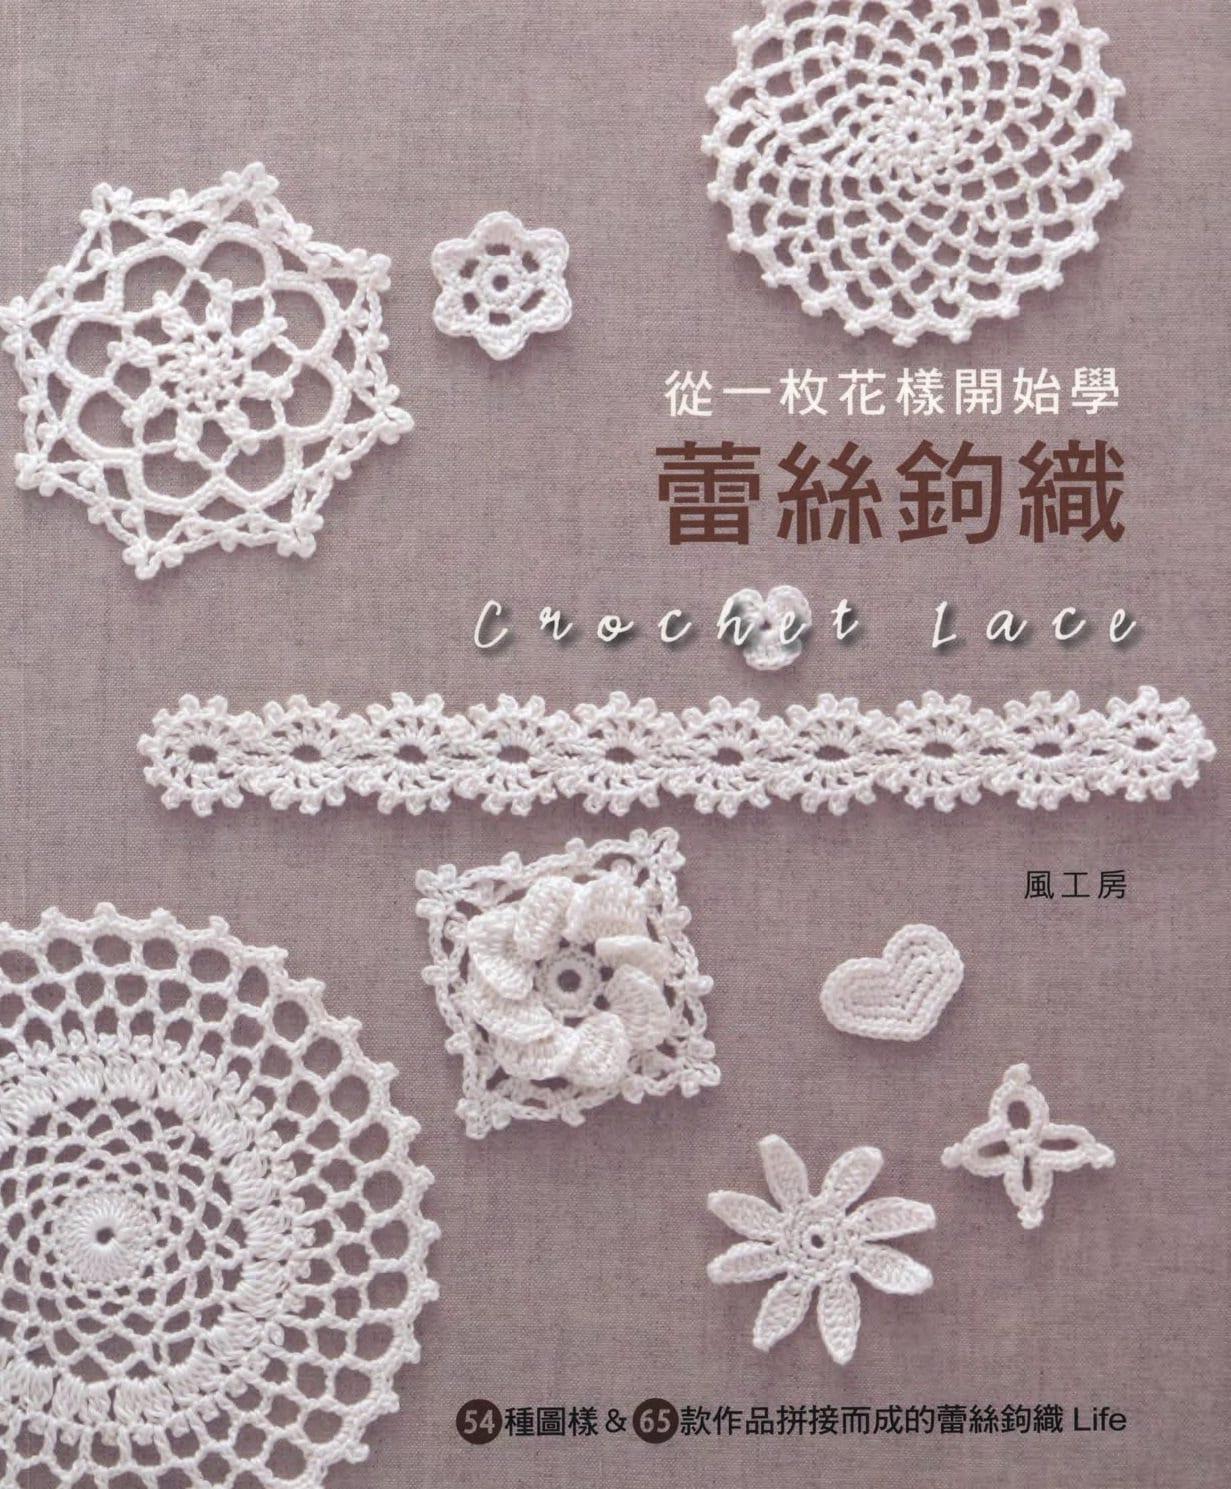 Crochet motif patterns crochet edging patterns crochet zoom bankloansurffo Image collections